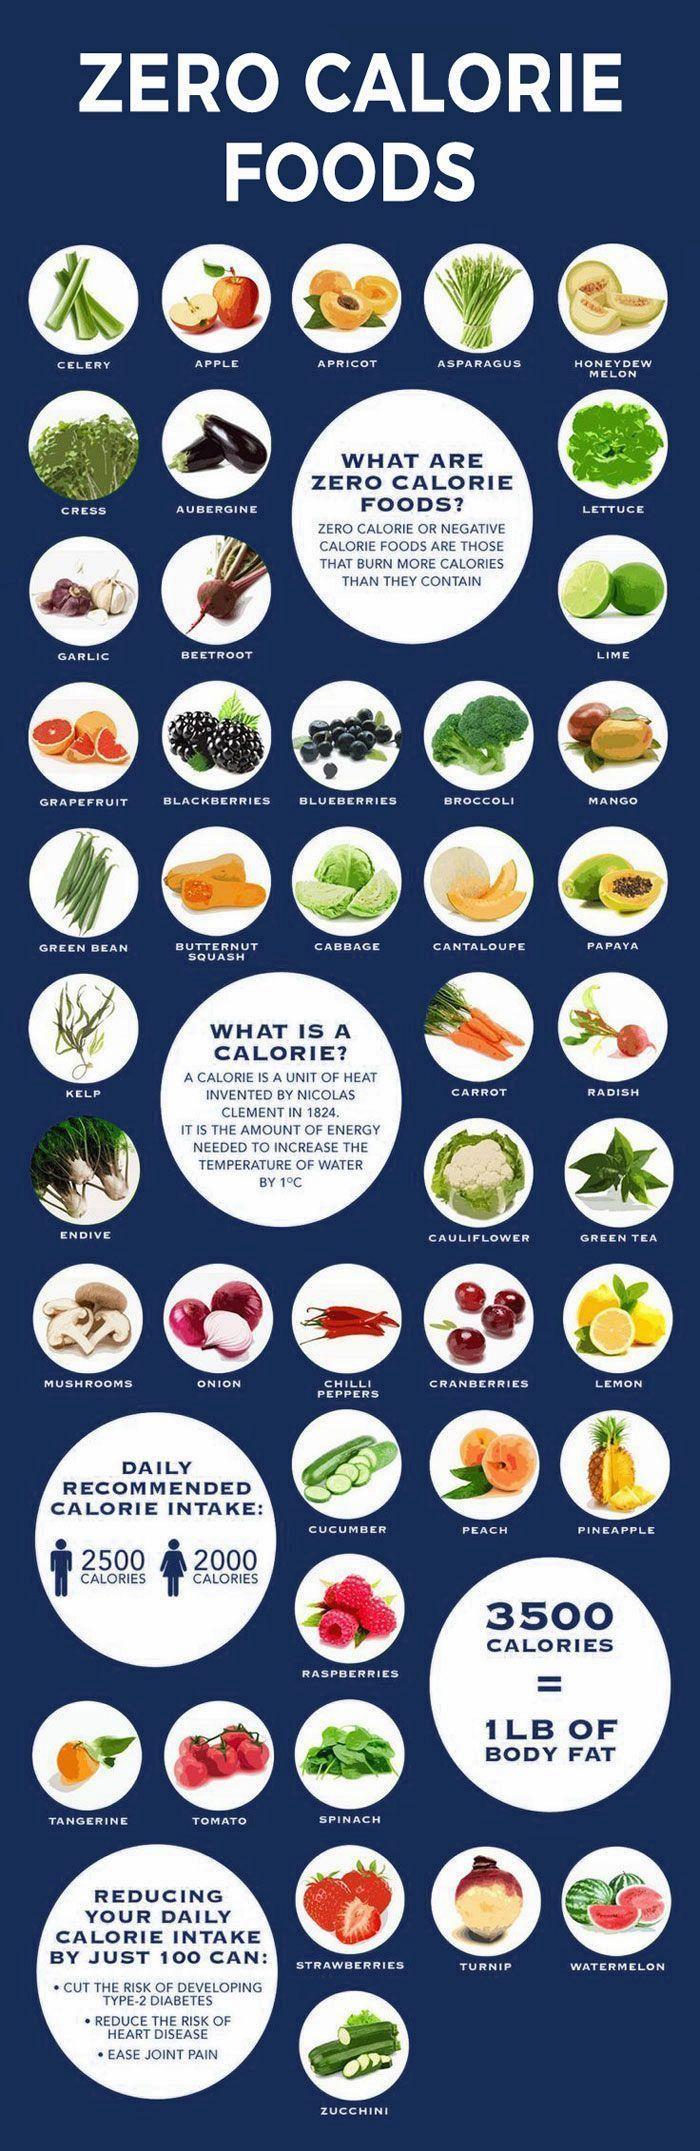 Zero calorie/negative calorie foods.